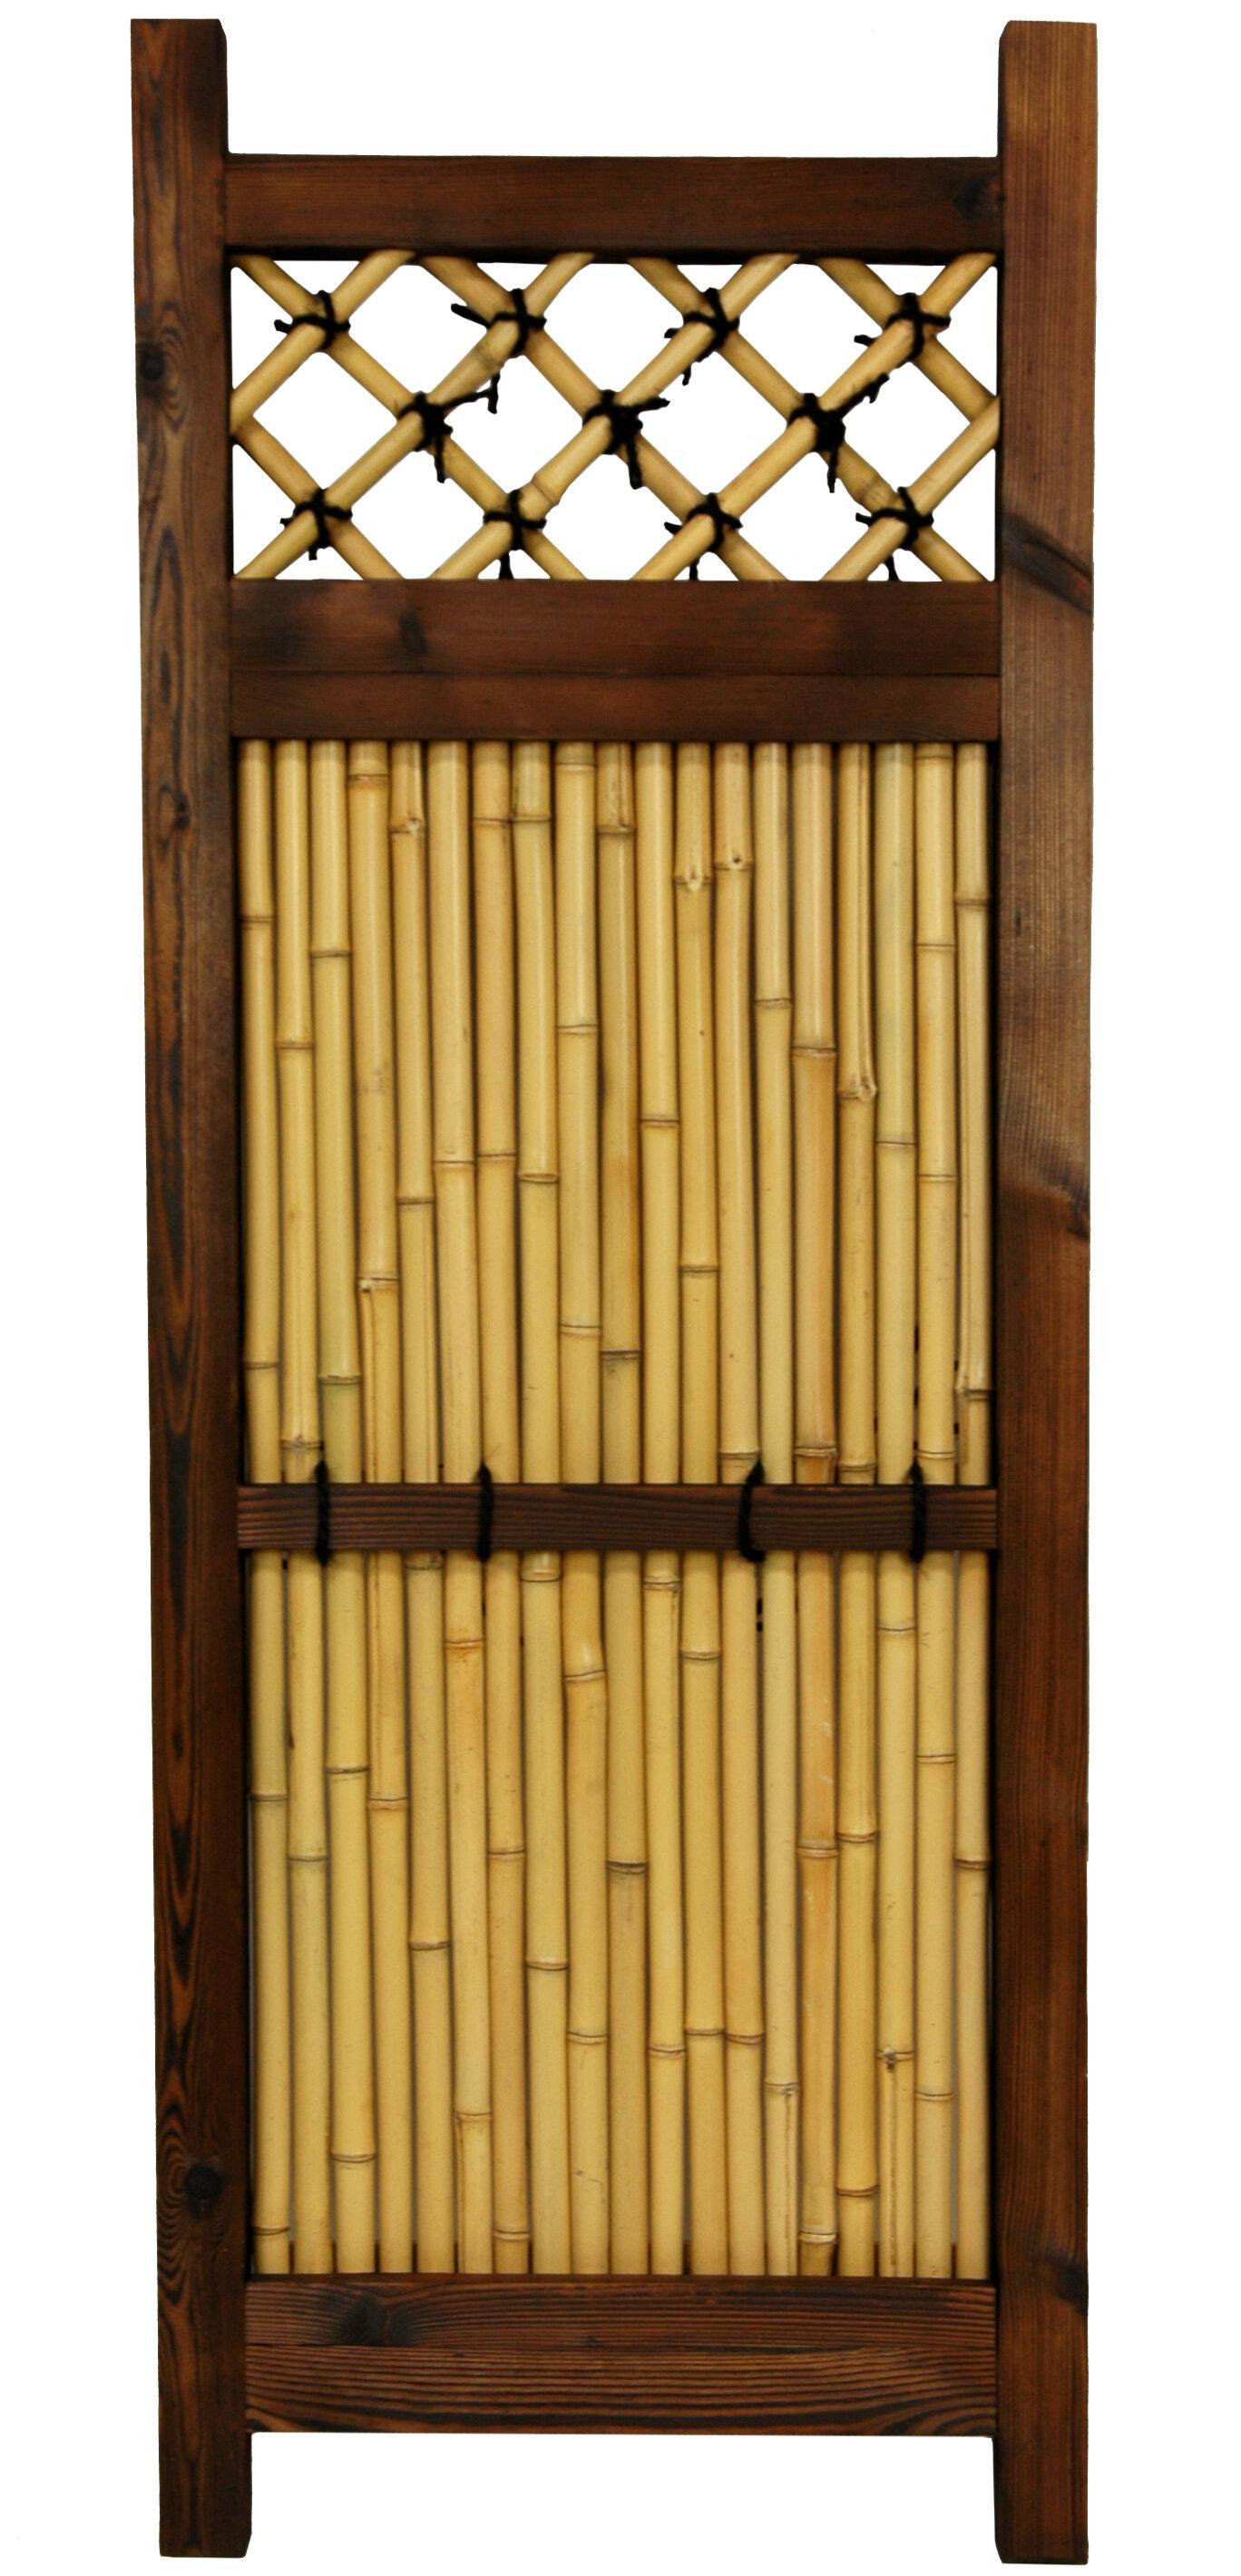 Oriental Furniture 4 ft. H x 1.5 ft. W Japanese Zen Garden Fence ...